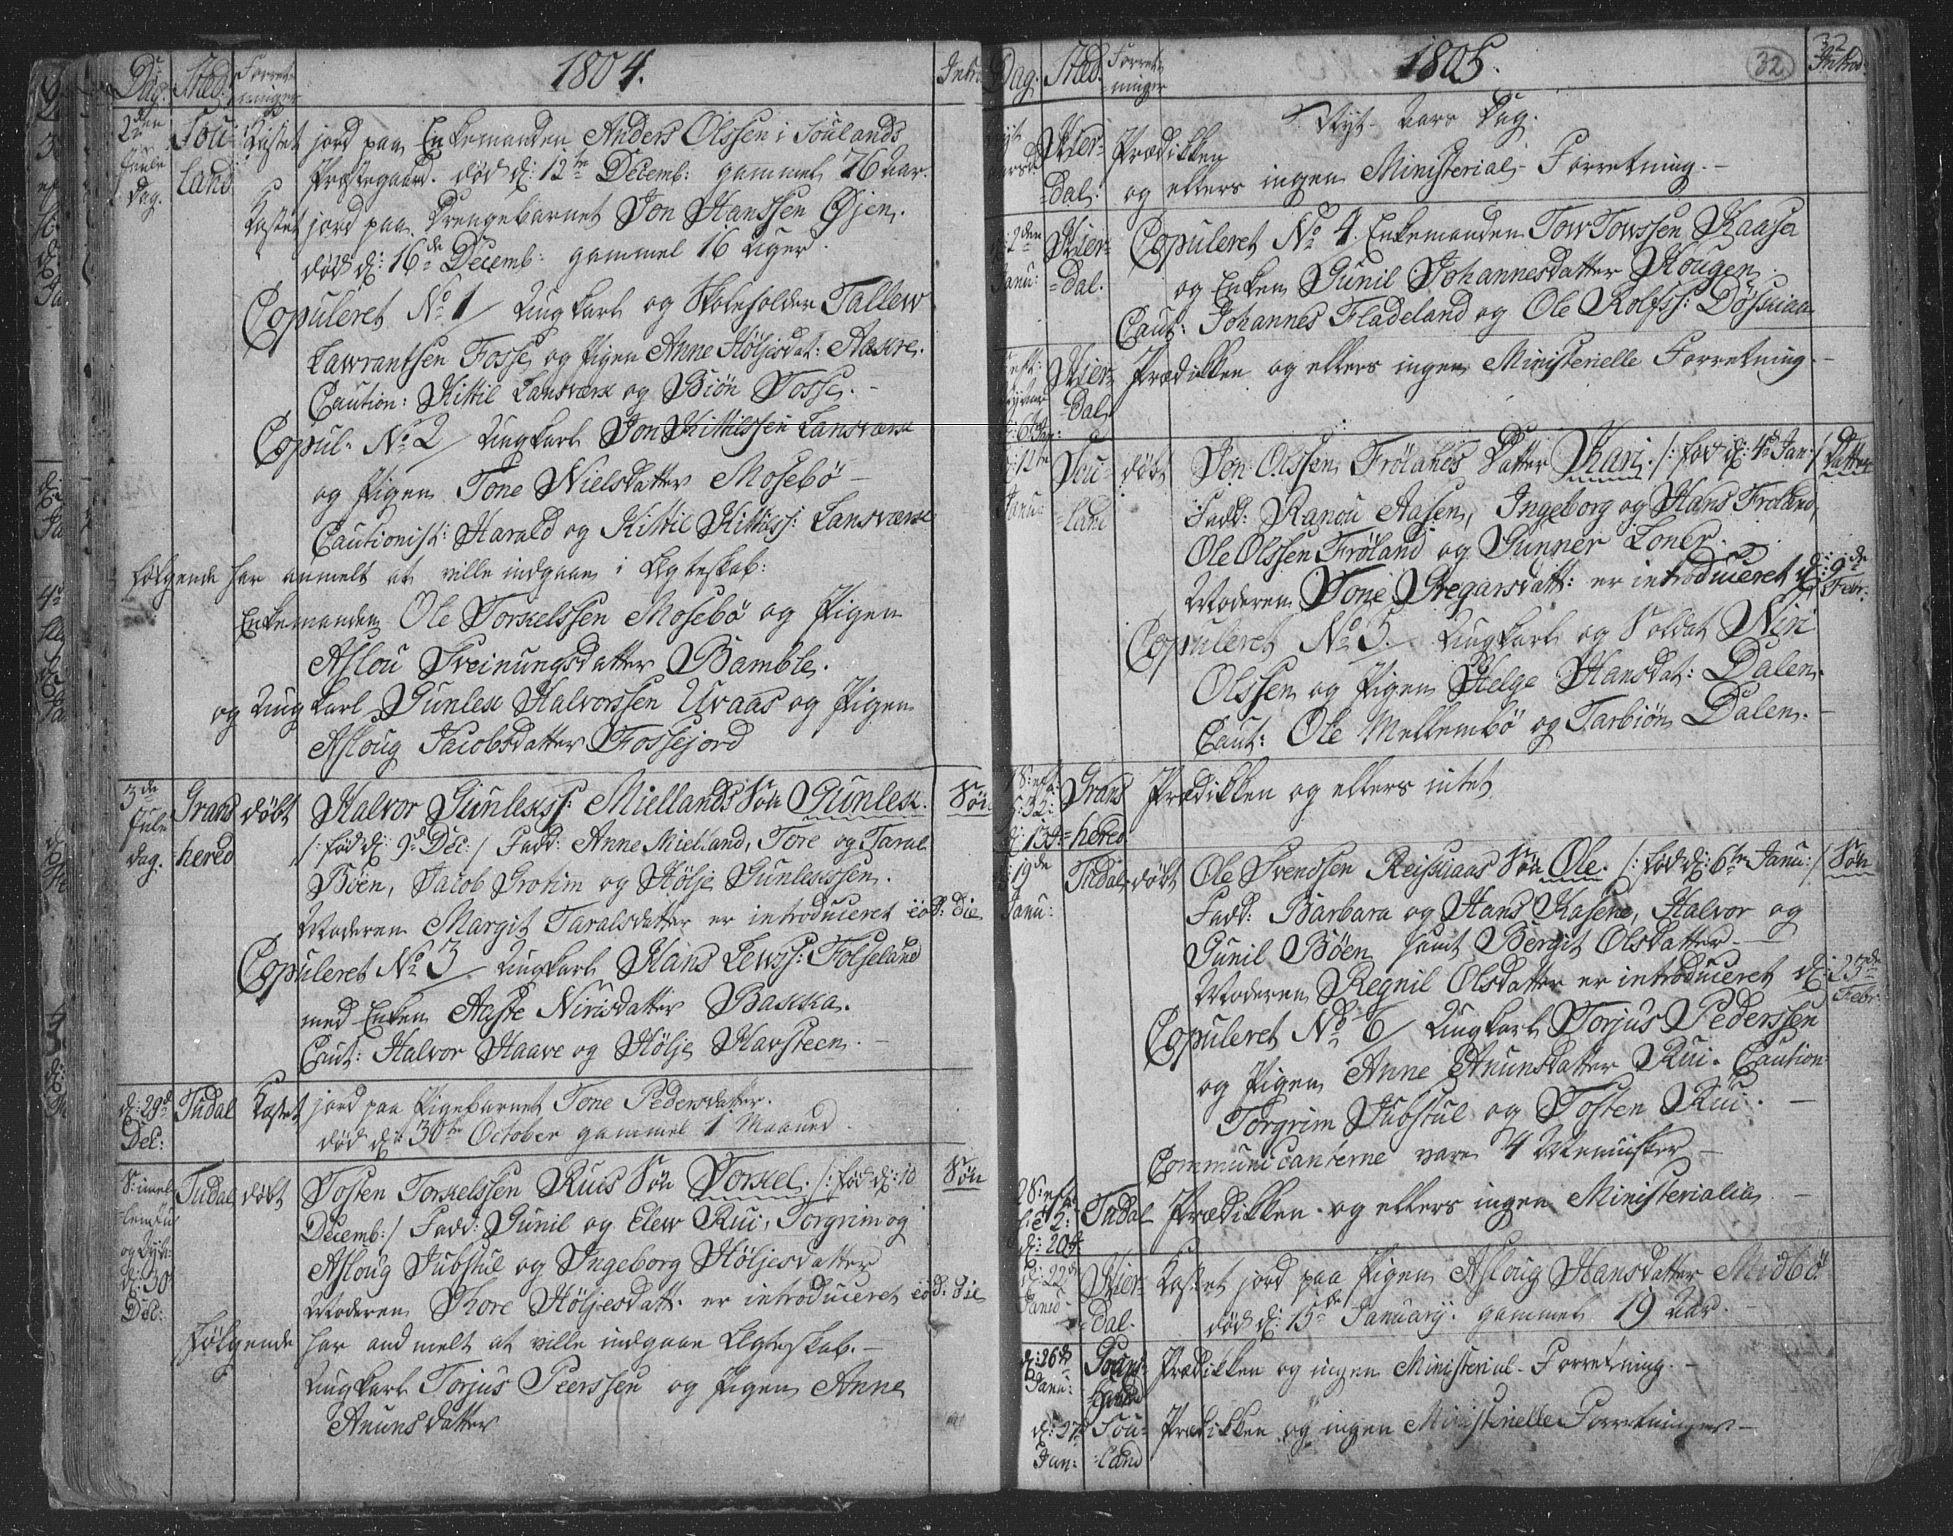 SAKO, Hjartdal kirkebøker, F/Fa/L0006: Ministerialbok nr. I 6, 1801-1814, s. 32